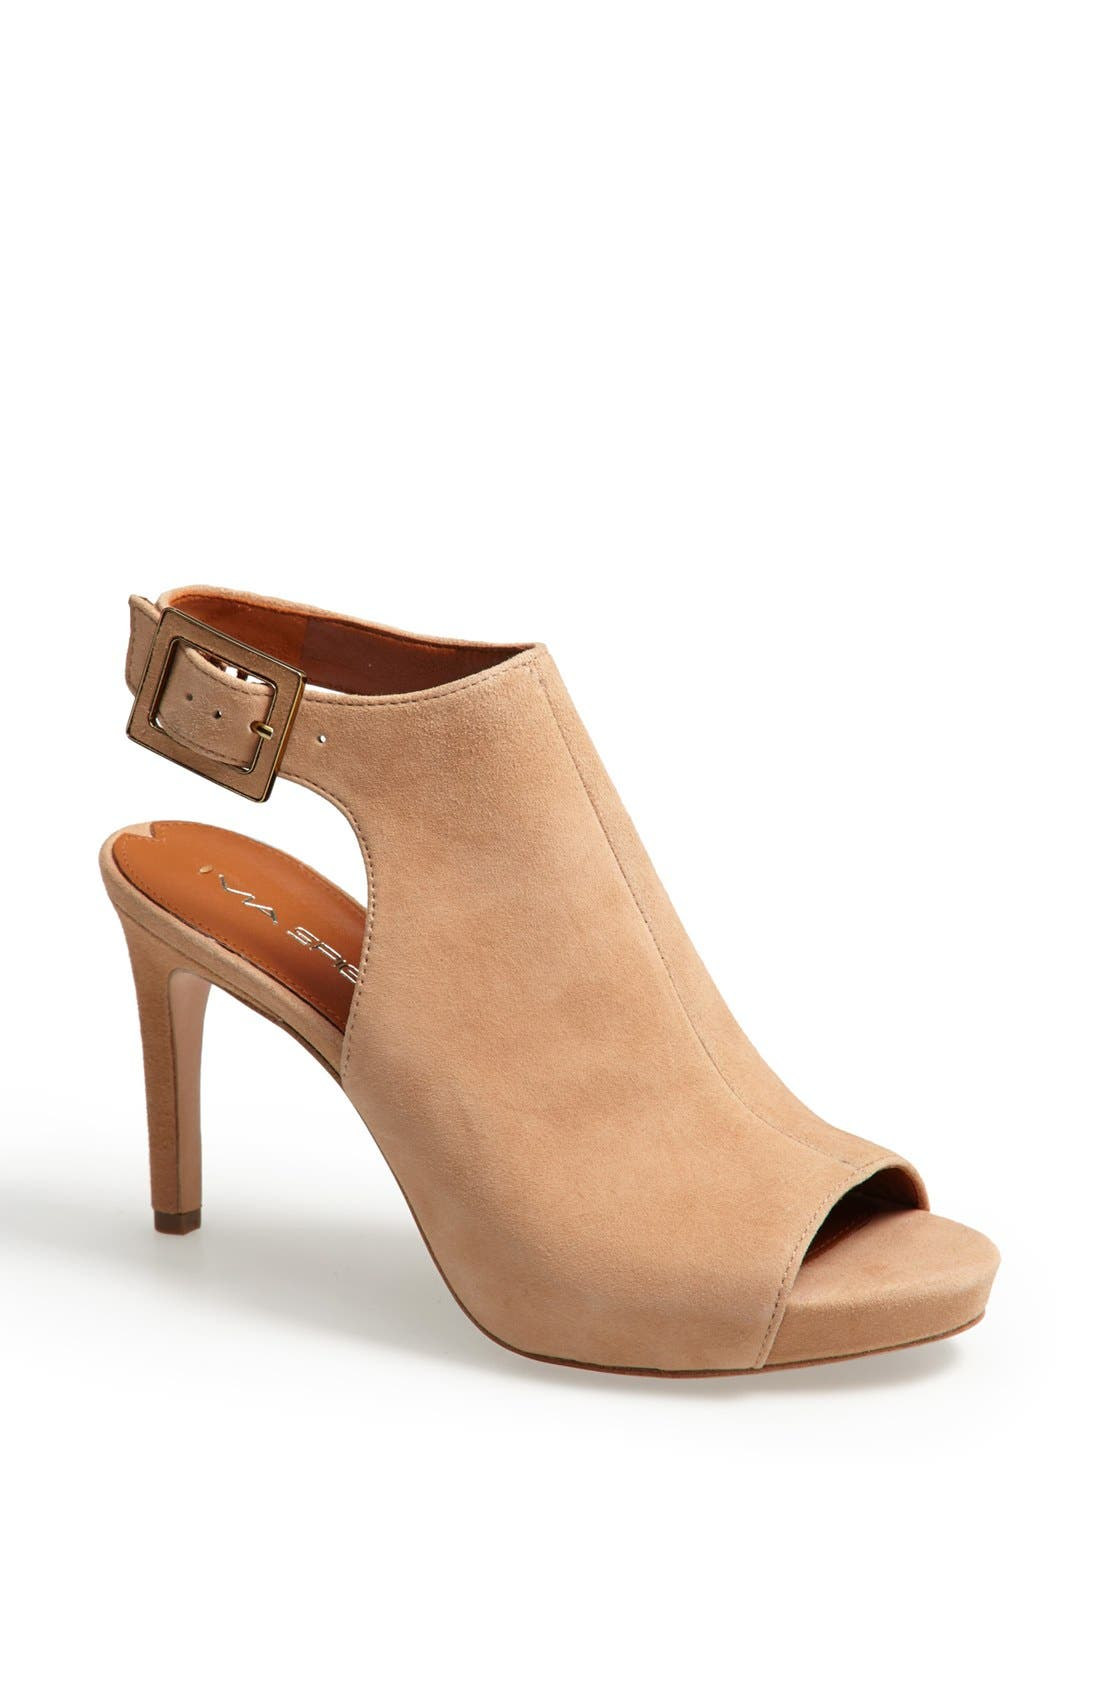 Alternate Image 1 Selected - Via Spiga 'Nino' Ankle Strap Sandal